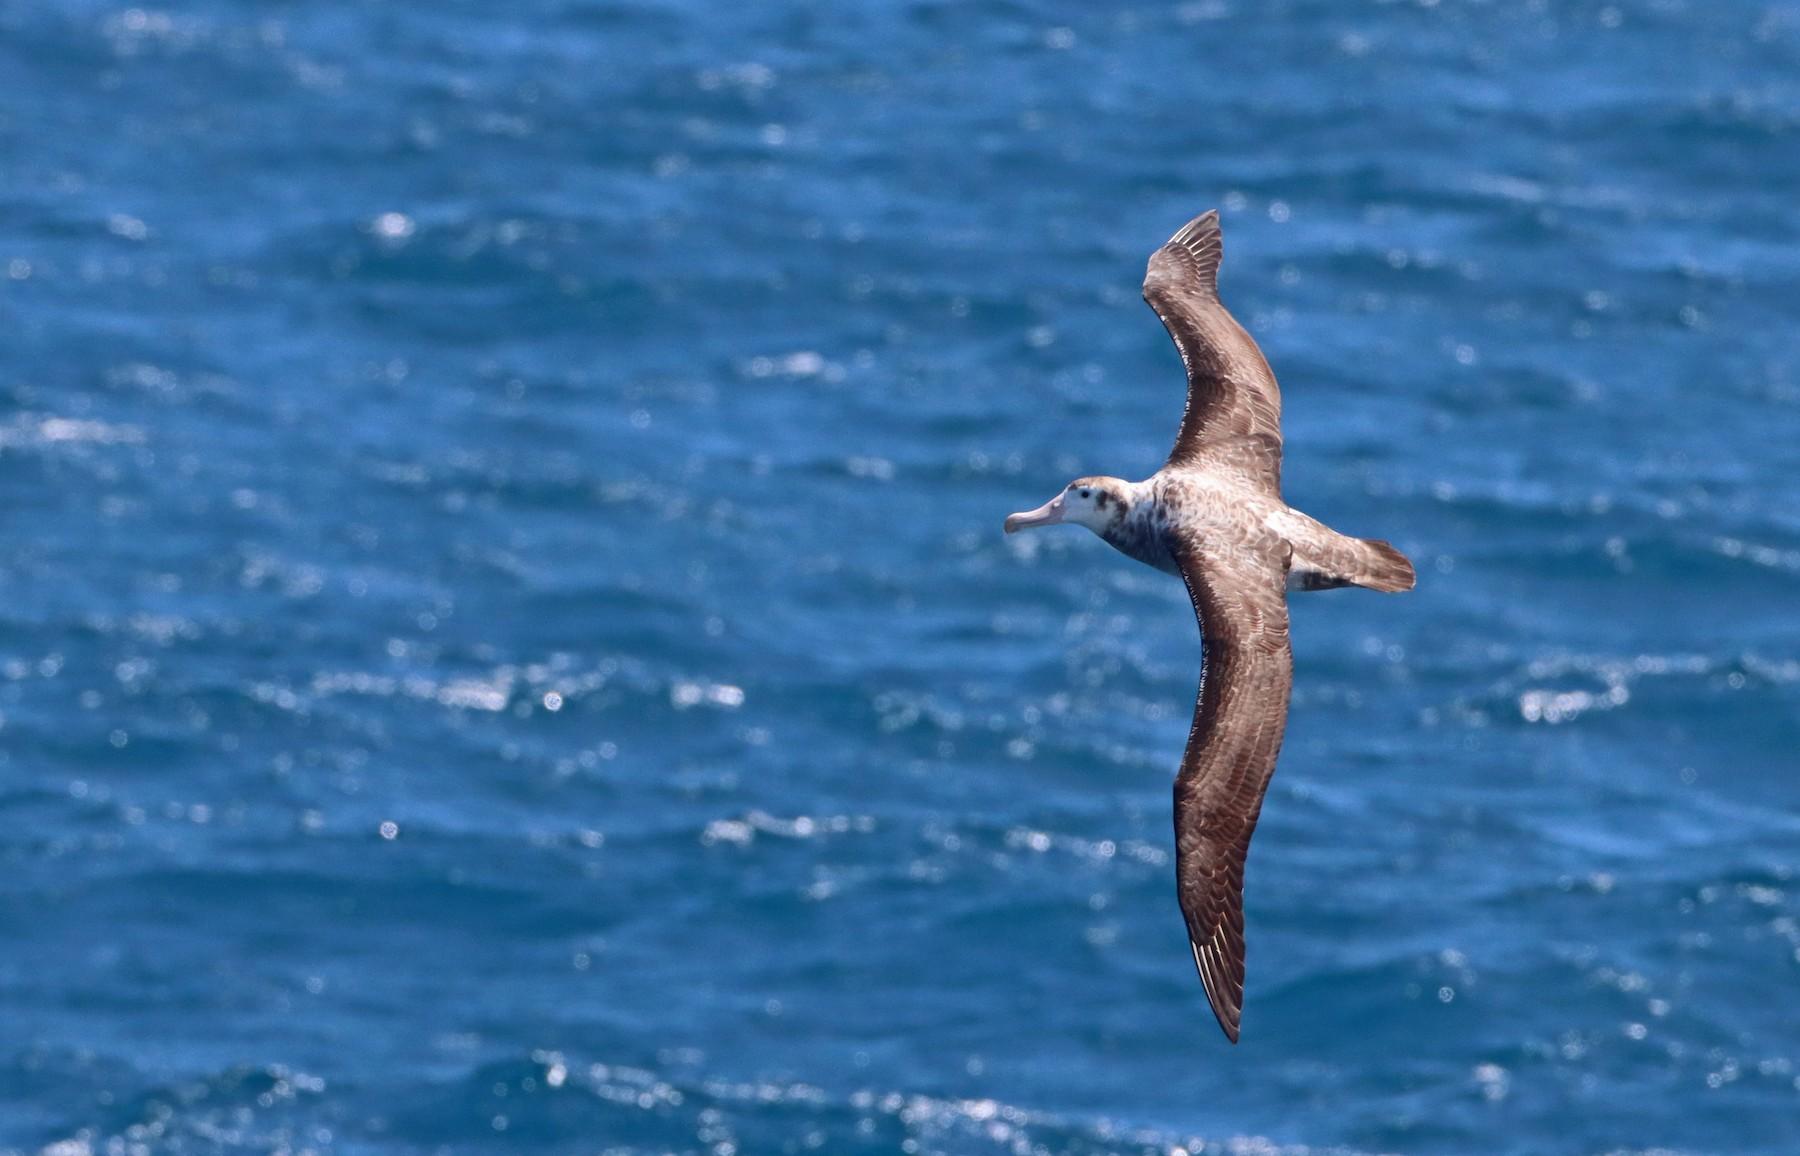 Wandering Albatross (Tristan) - Luke Seitz